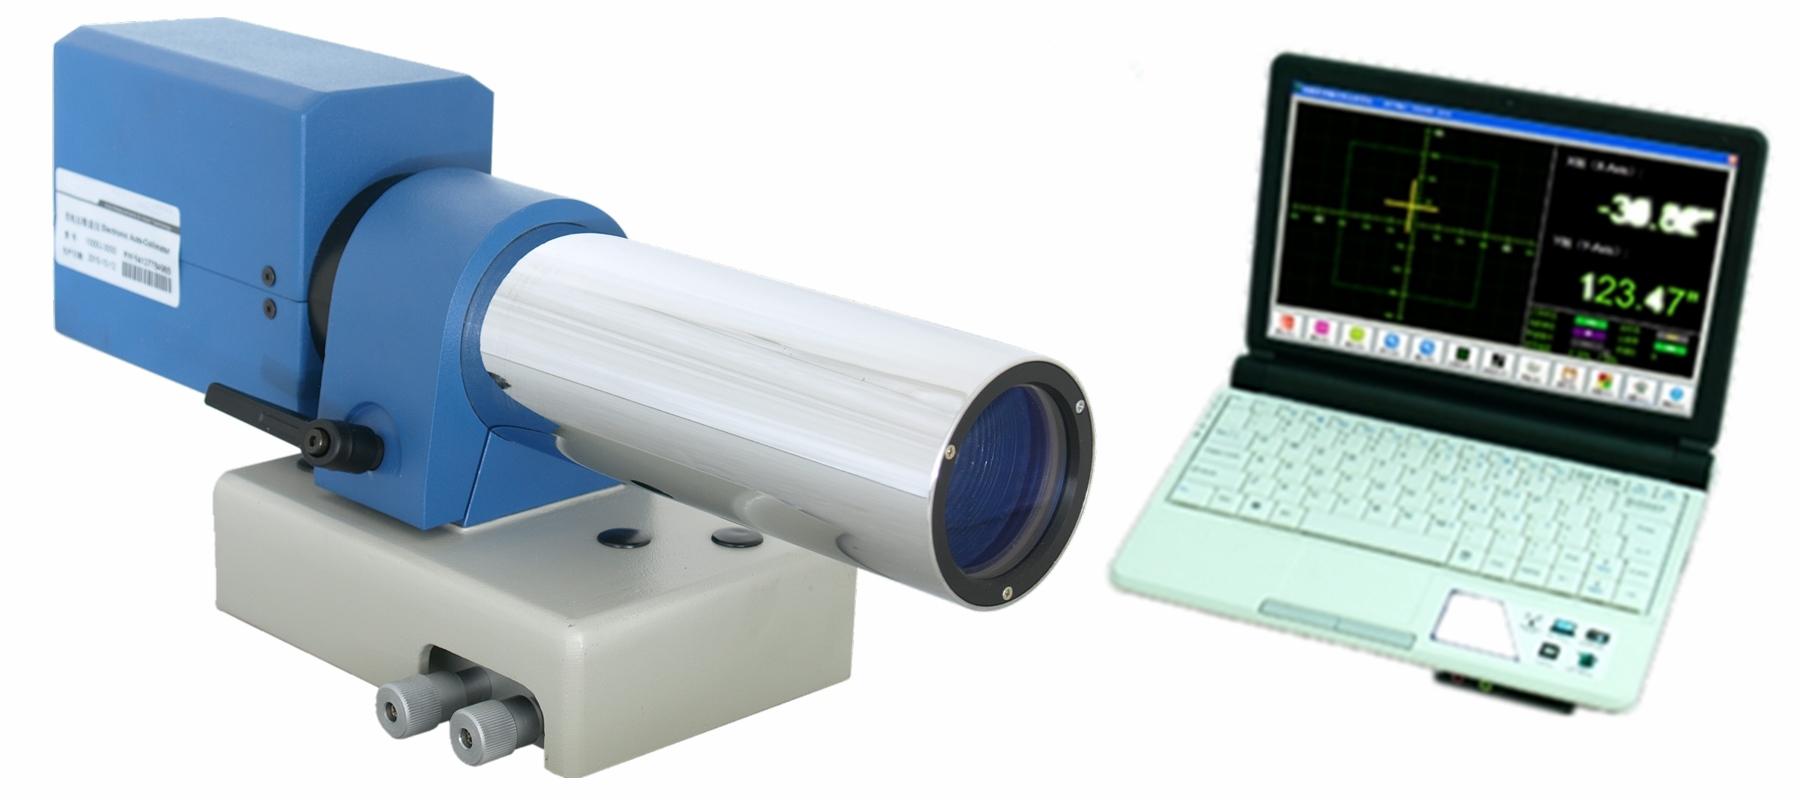 HCHV-2050/3050型 高速大视场高精度双轴电子光电自准直仪